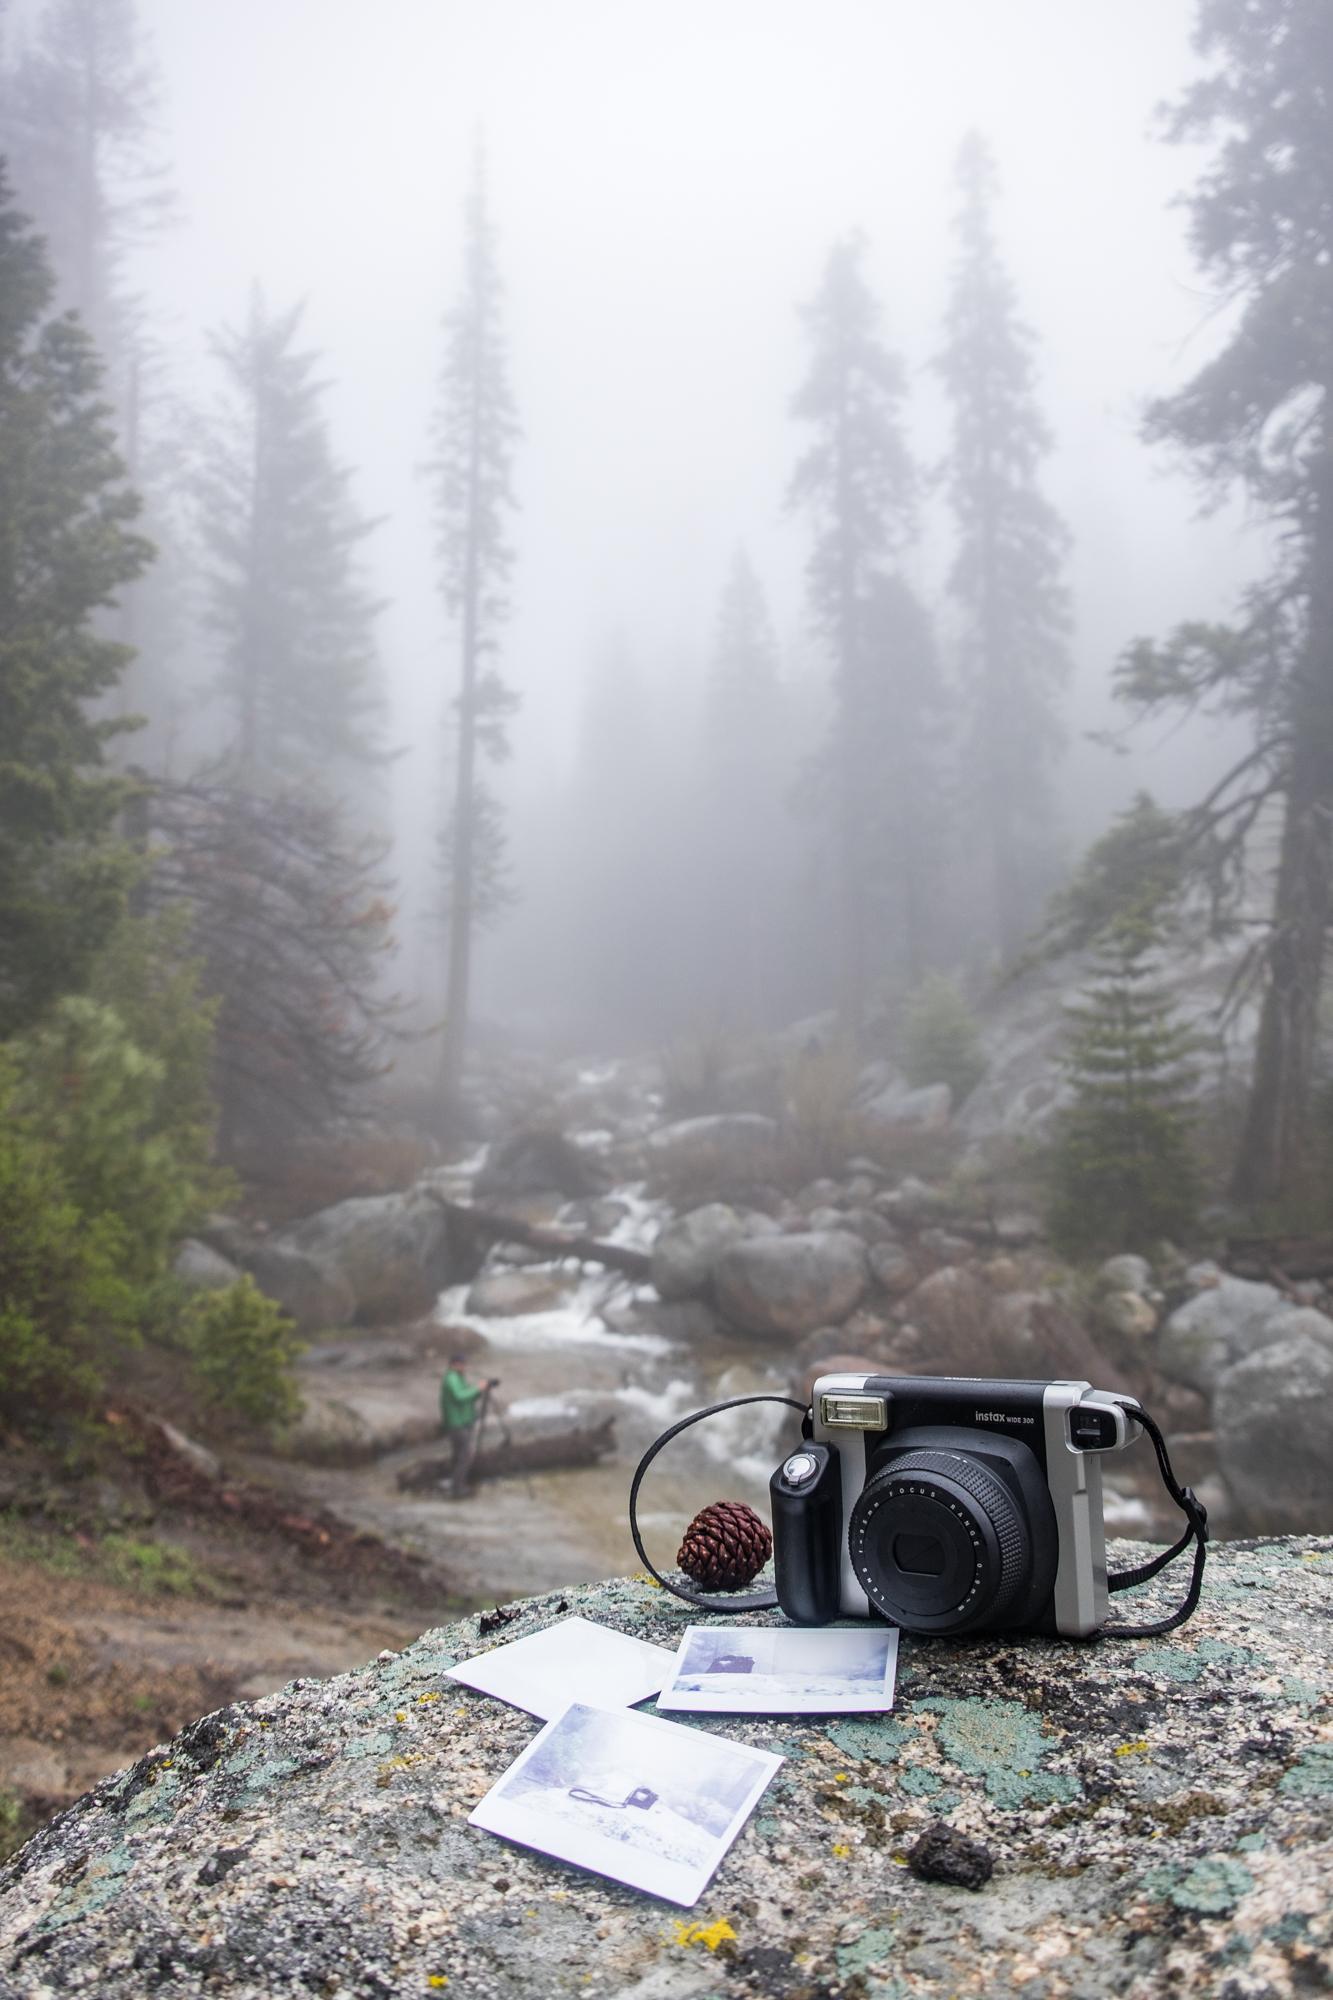 Our beloved Fujifilm Instax camera.